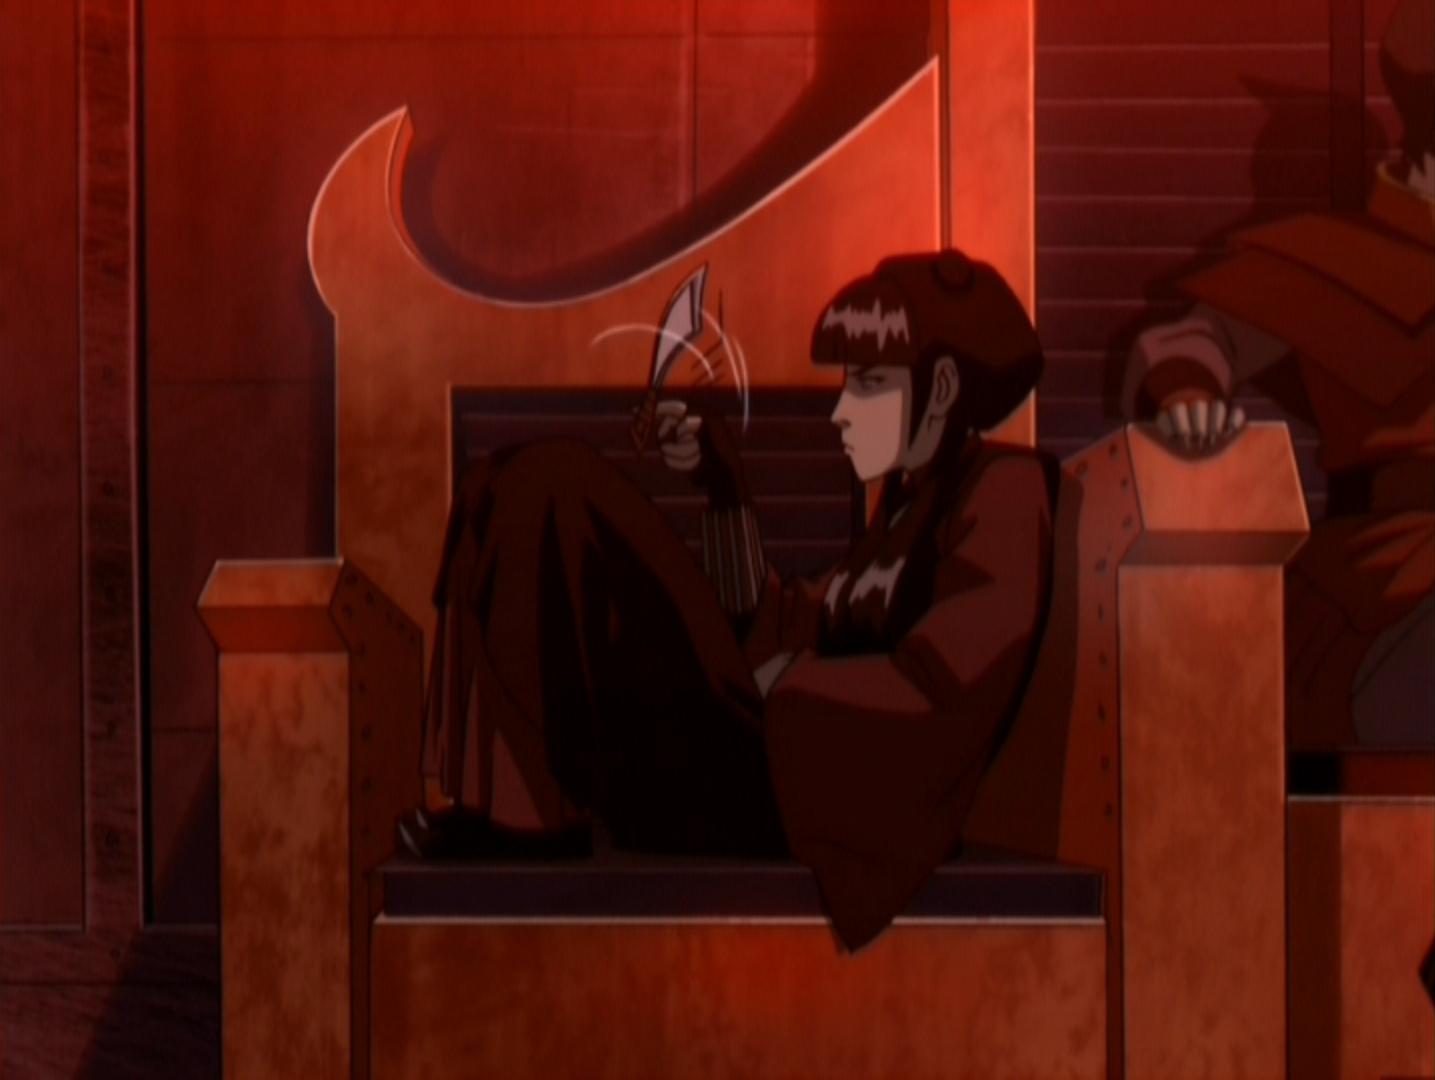 Avatar, Relationships Done Right pt  2: Mai & Zuko